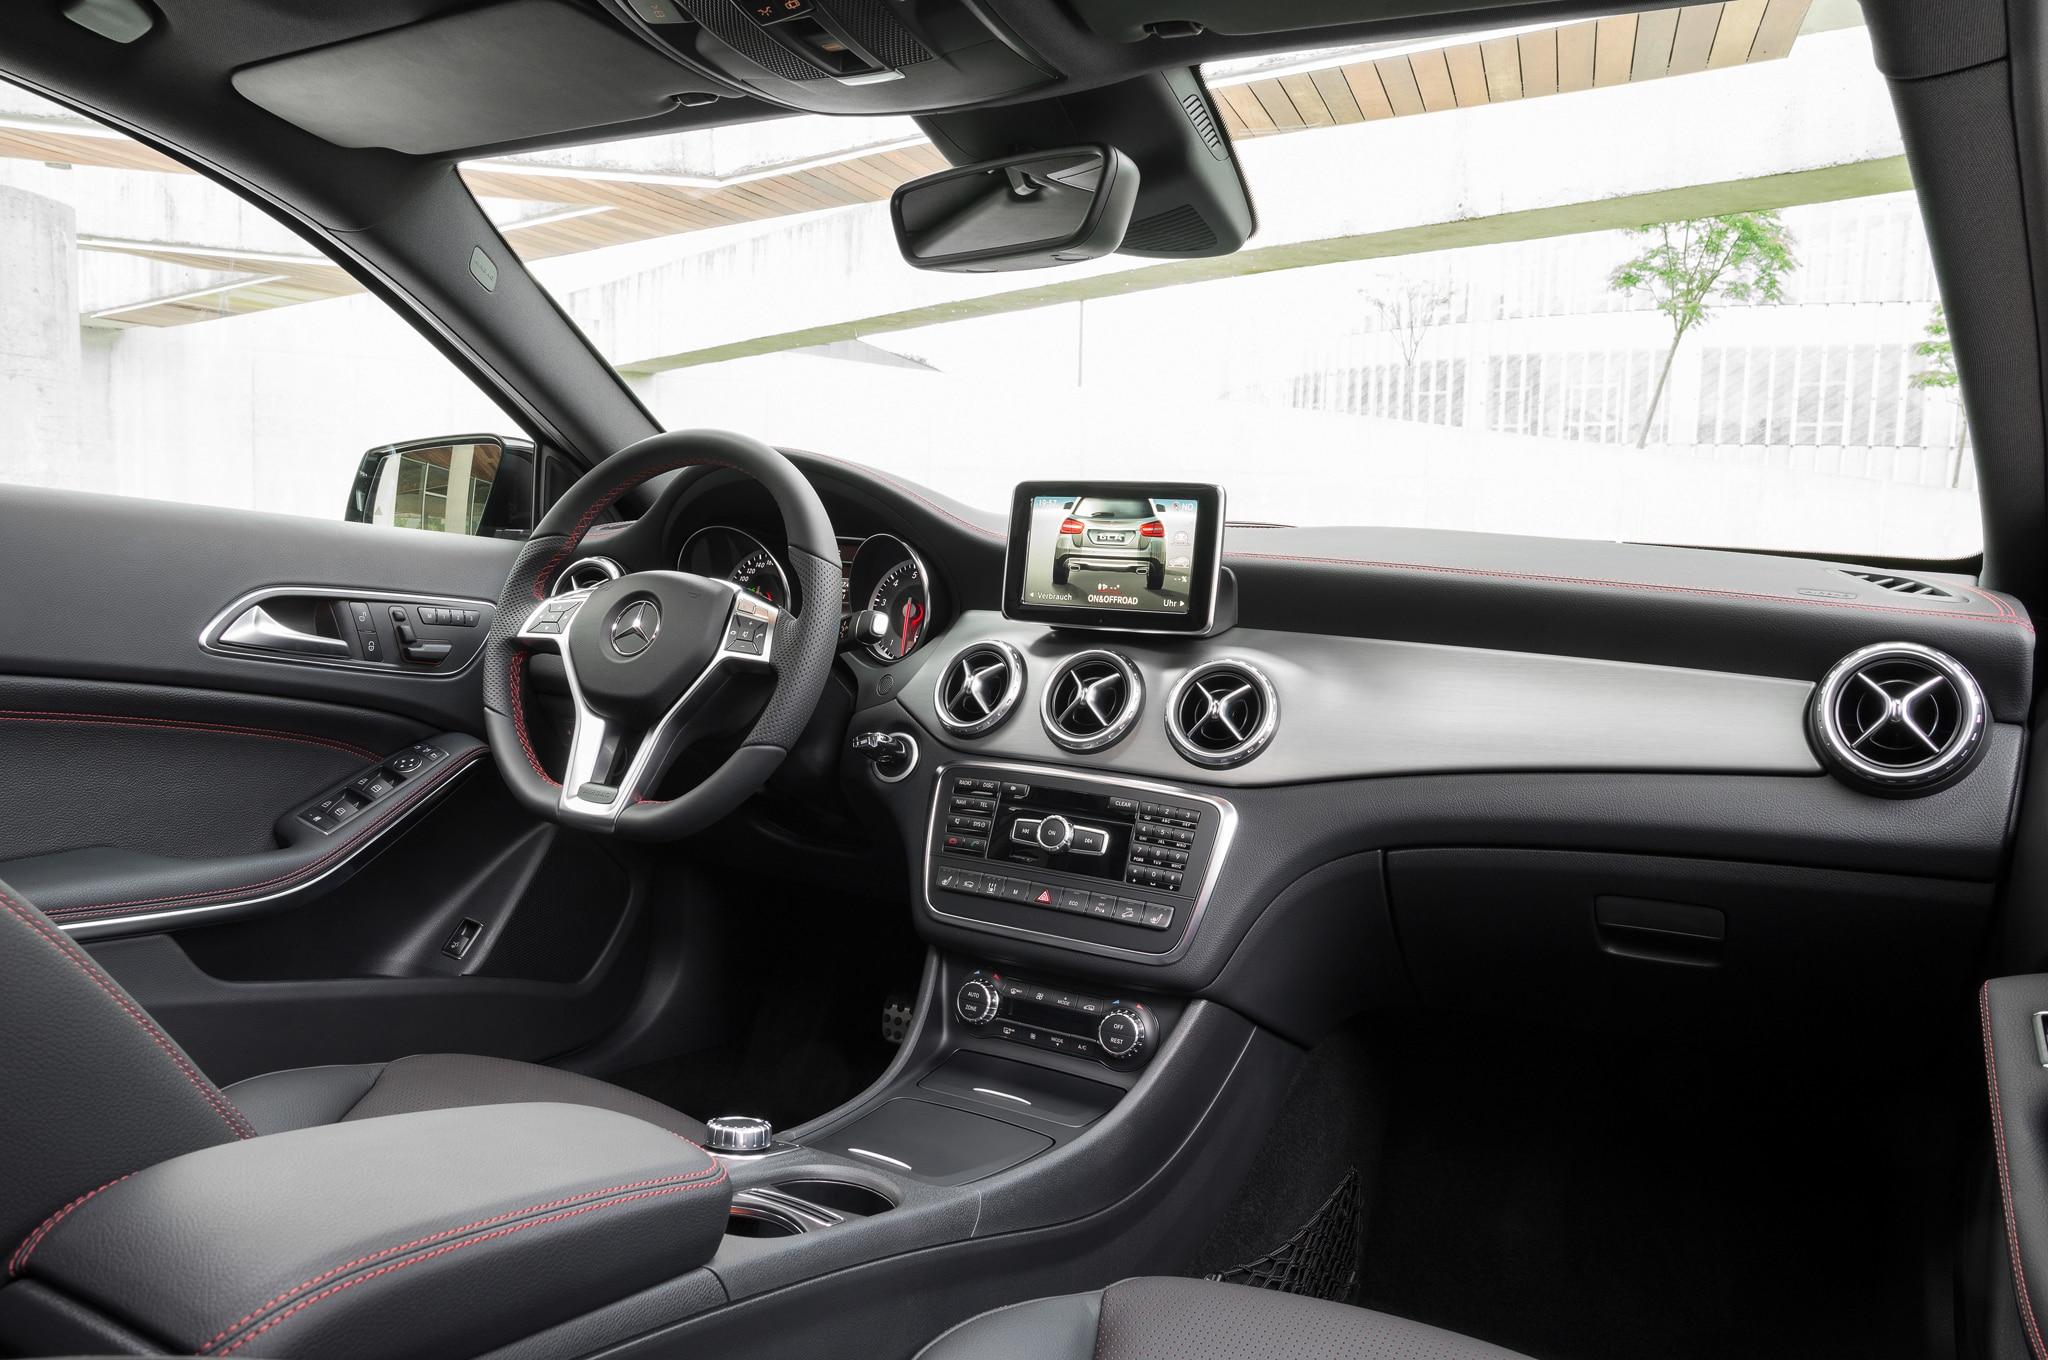 2015 Mercedes Benz Amg Gt Interior Revealed Automobile Magazine Gla Class